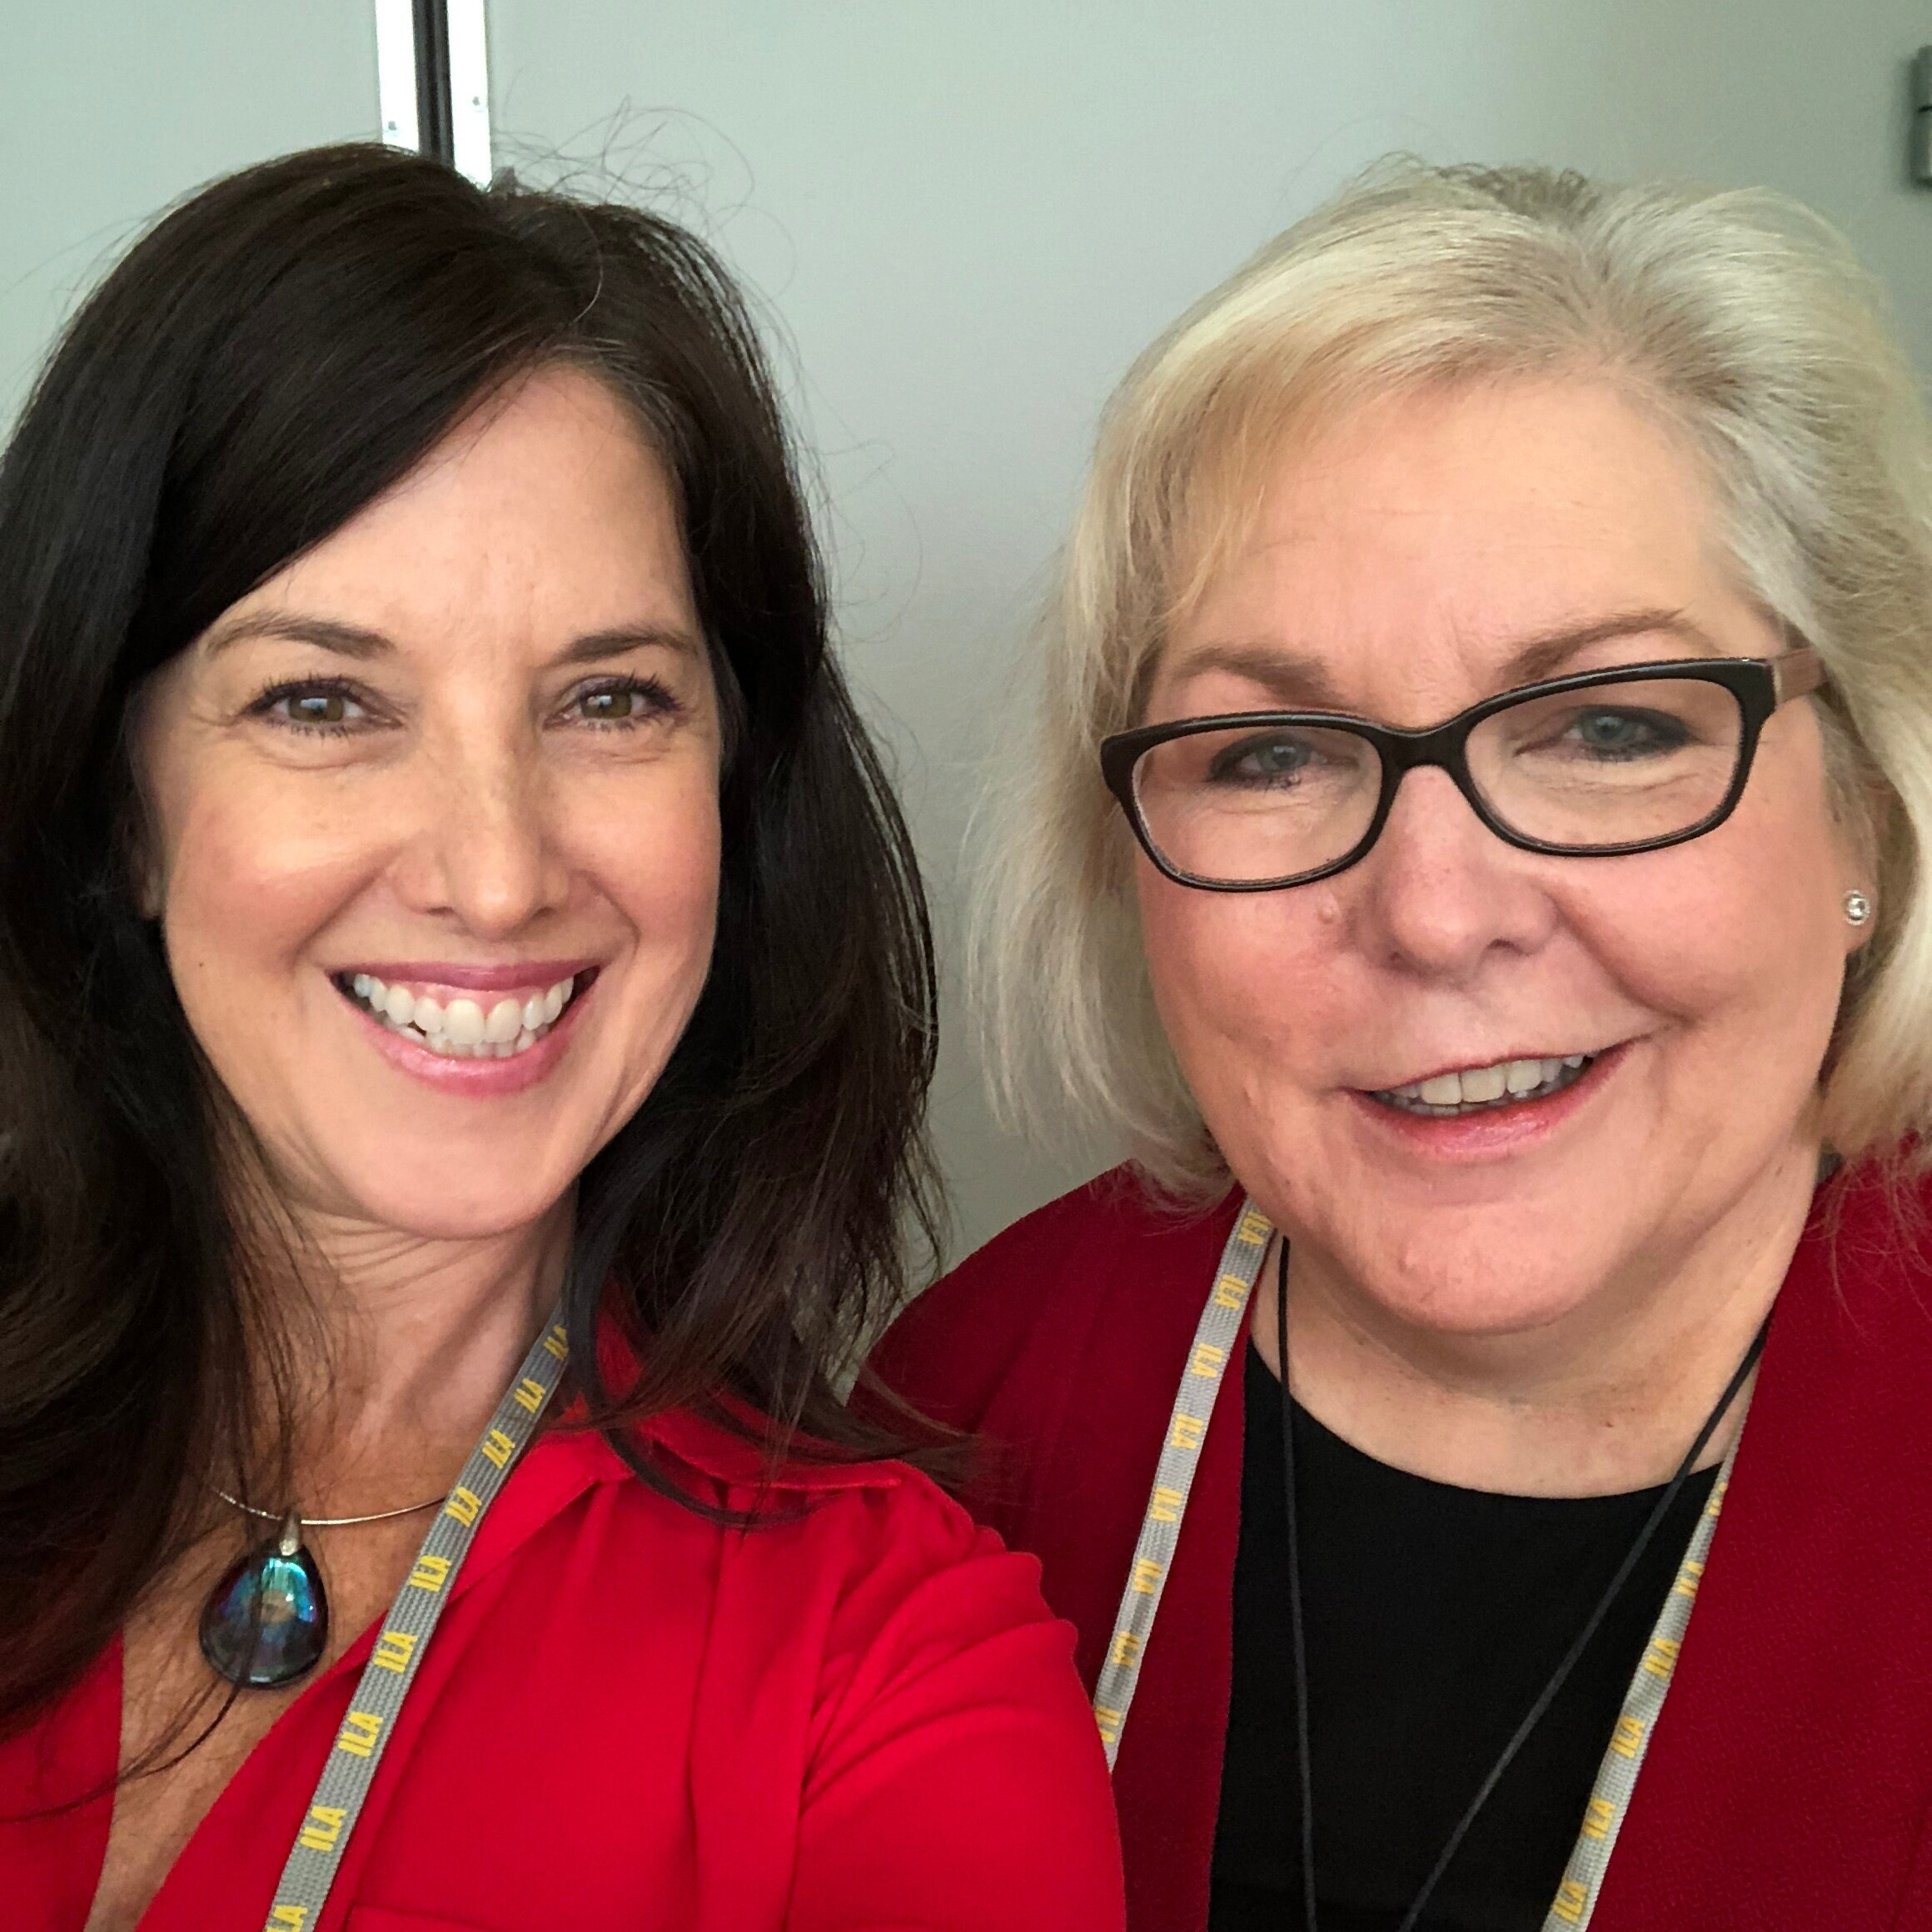 Dr. Nancy Frey and I at ILA Austin 2018